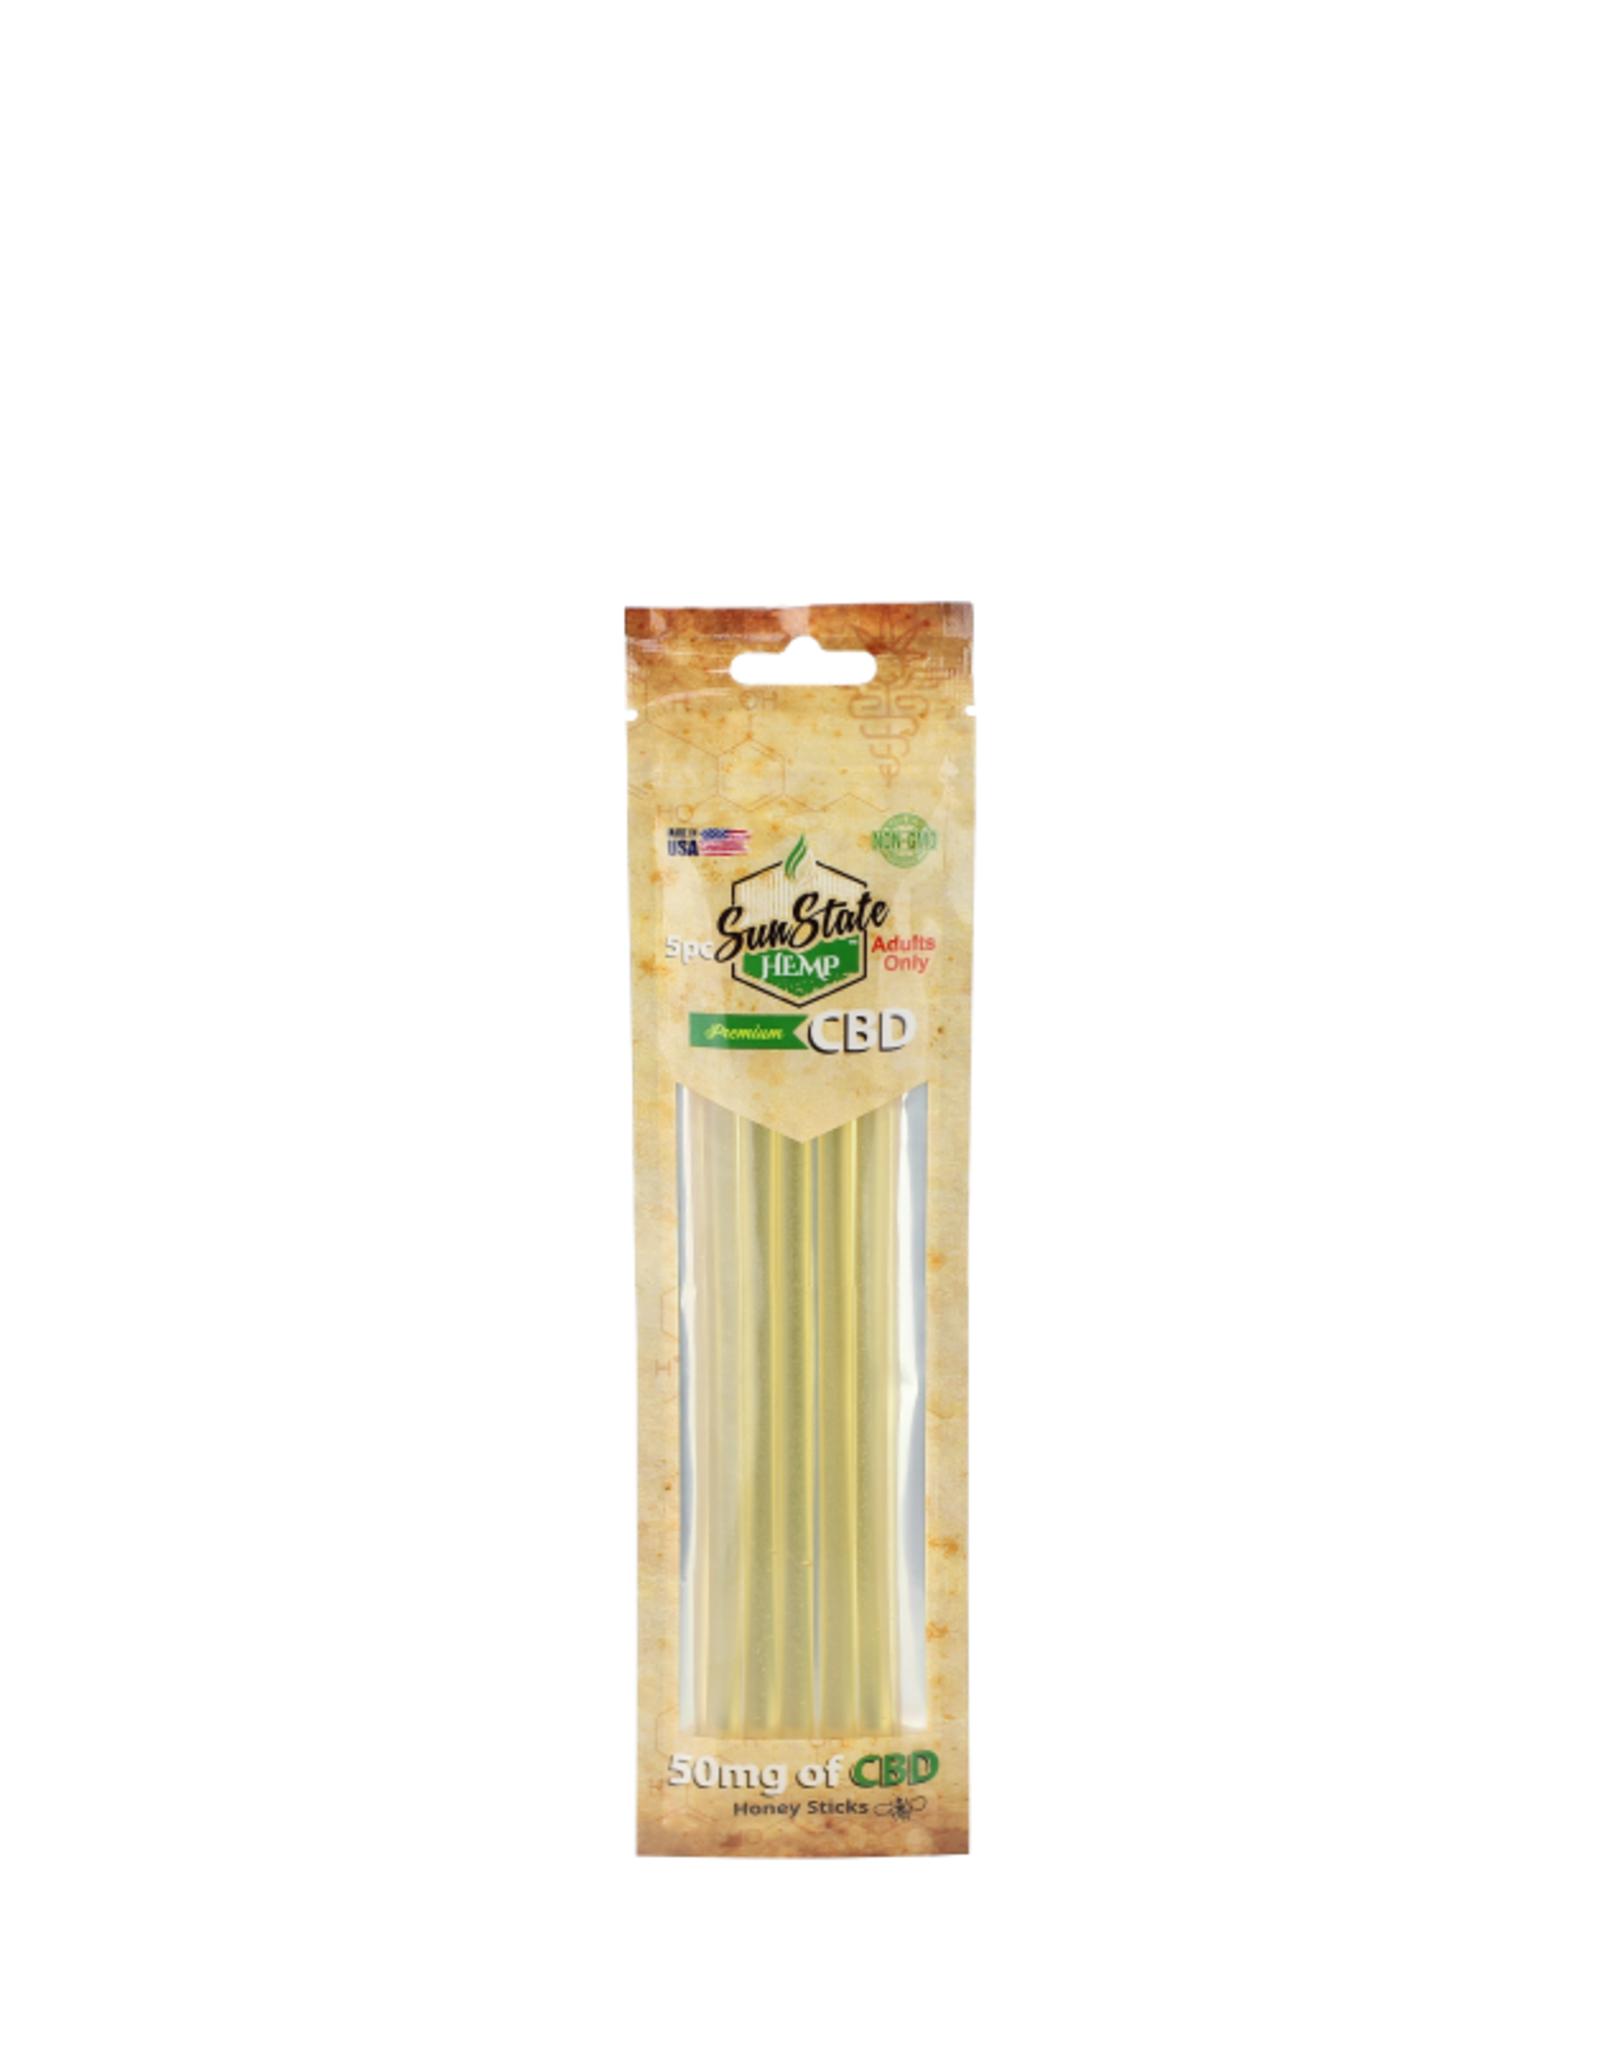 SunState Honey Sticks 5pcs